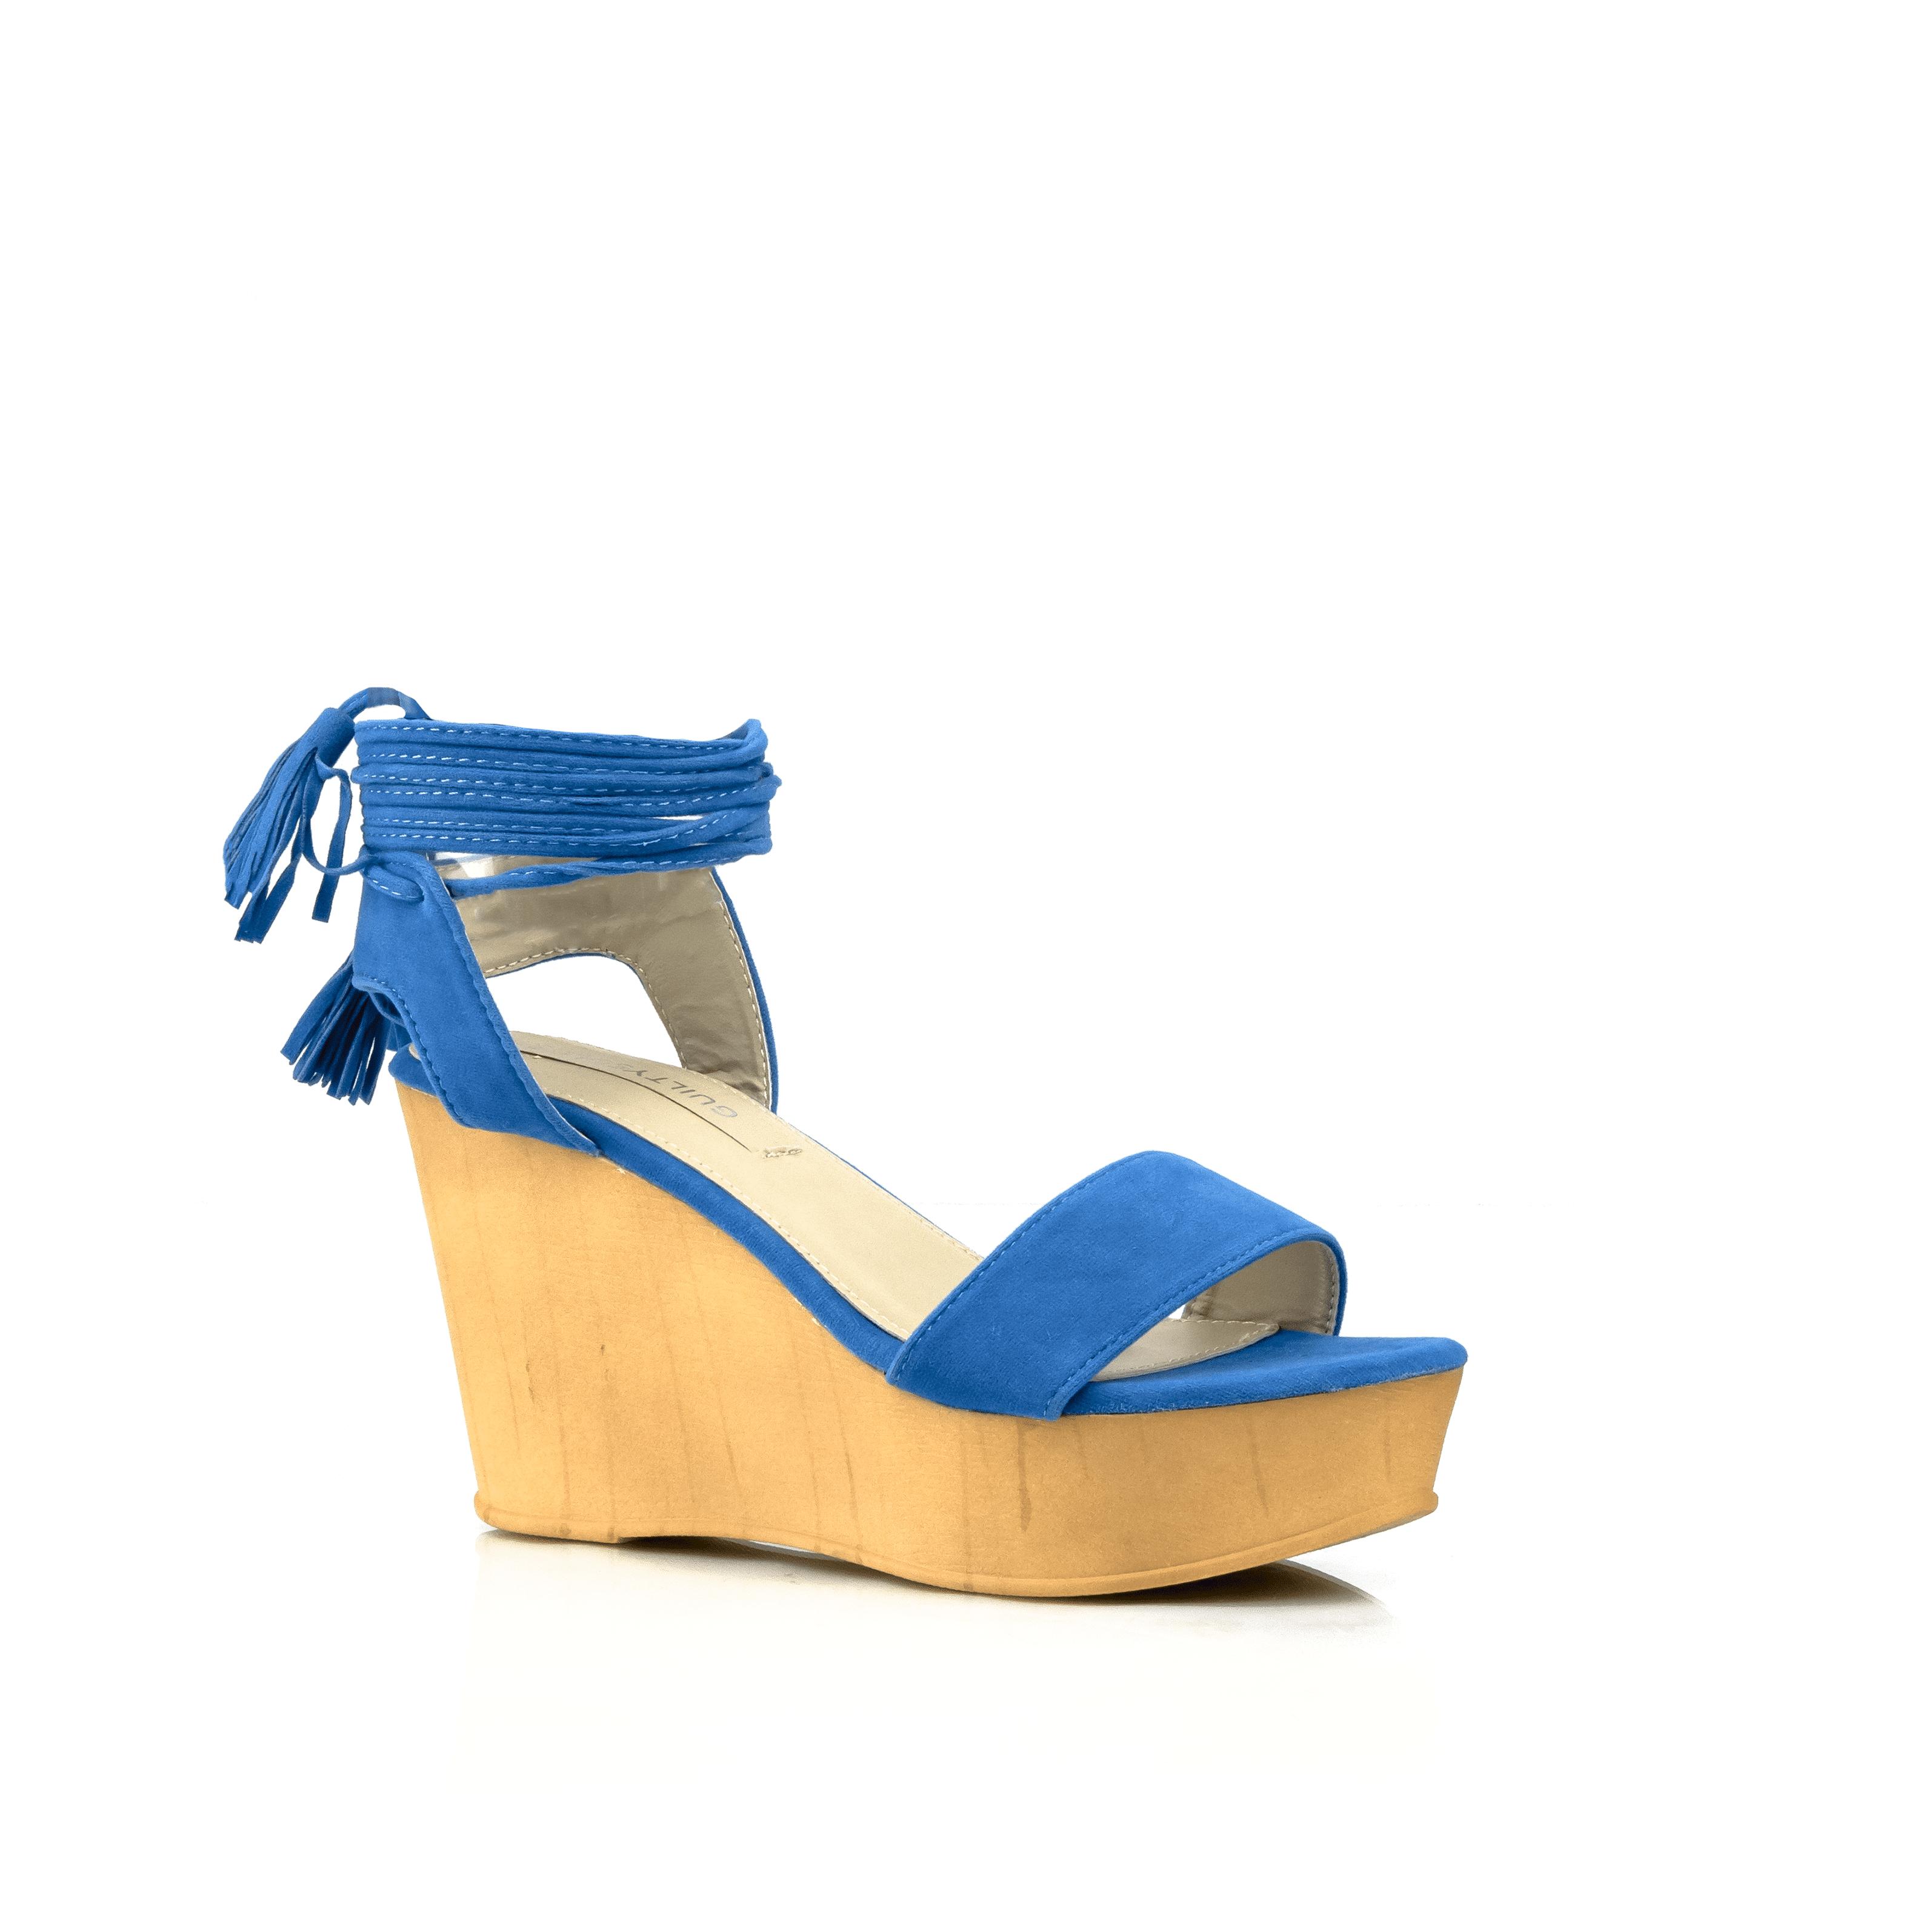 CALI Ankle Wrap Wrap Ankle Wedges, Blue, 8 e1ceb9